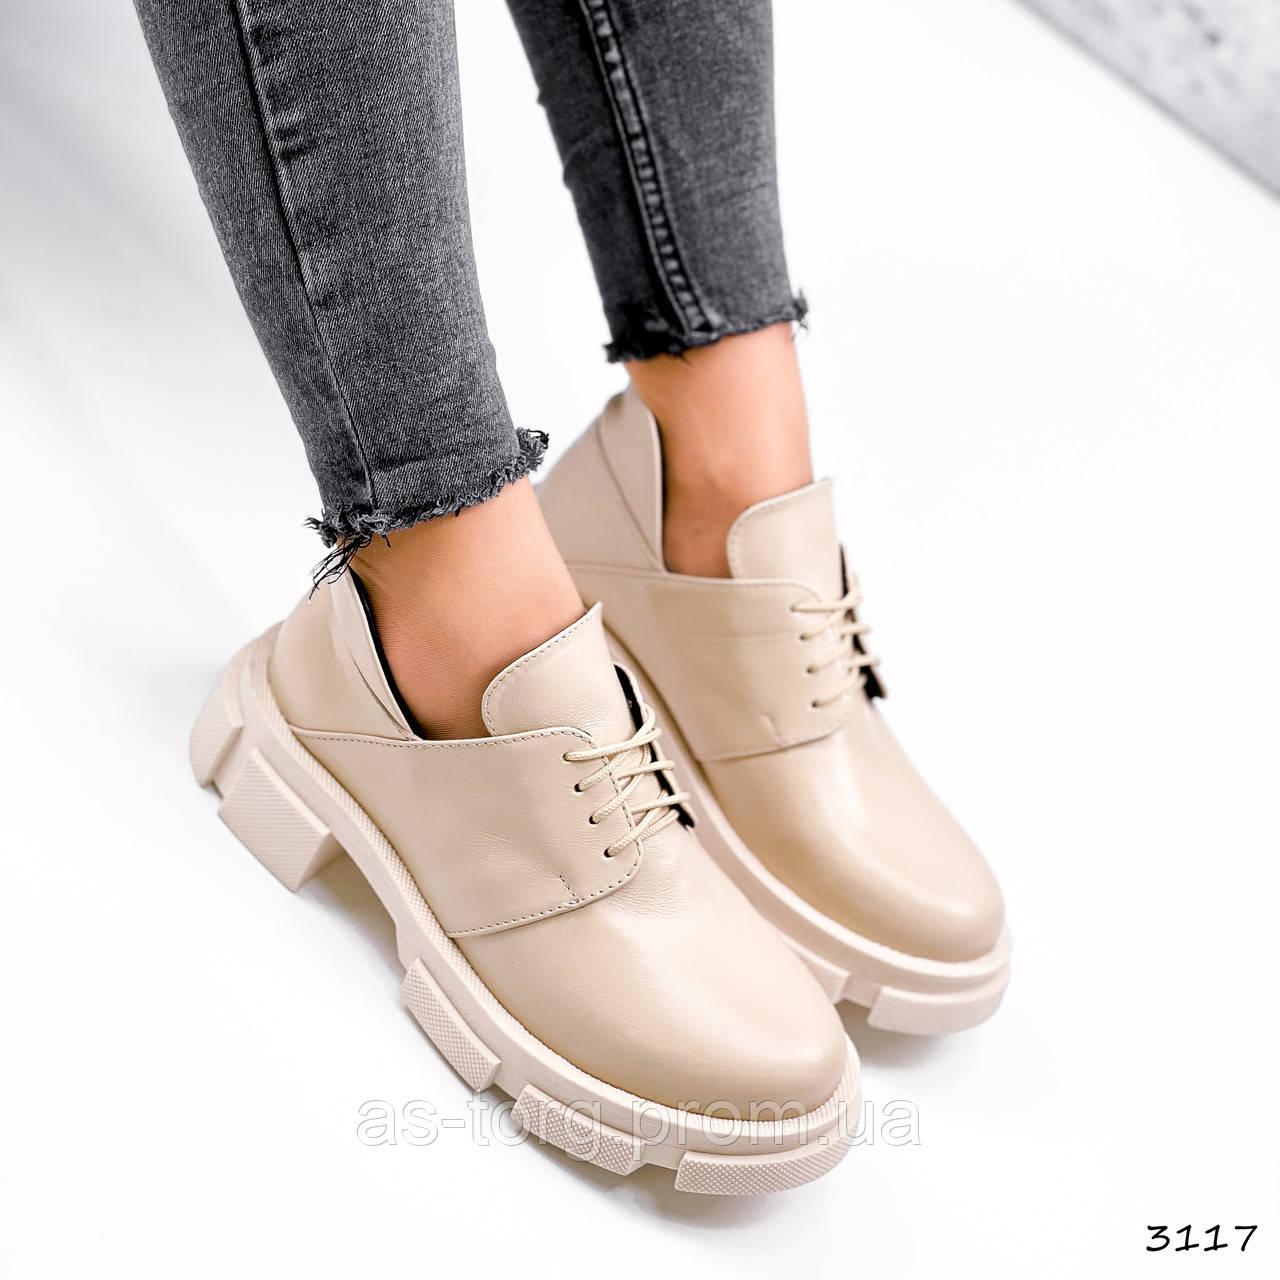 Ботинки женские Nita беж 3117